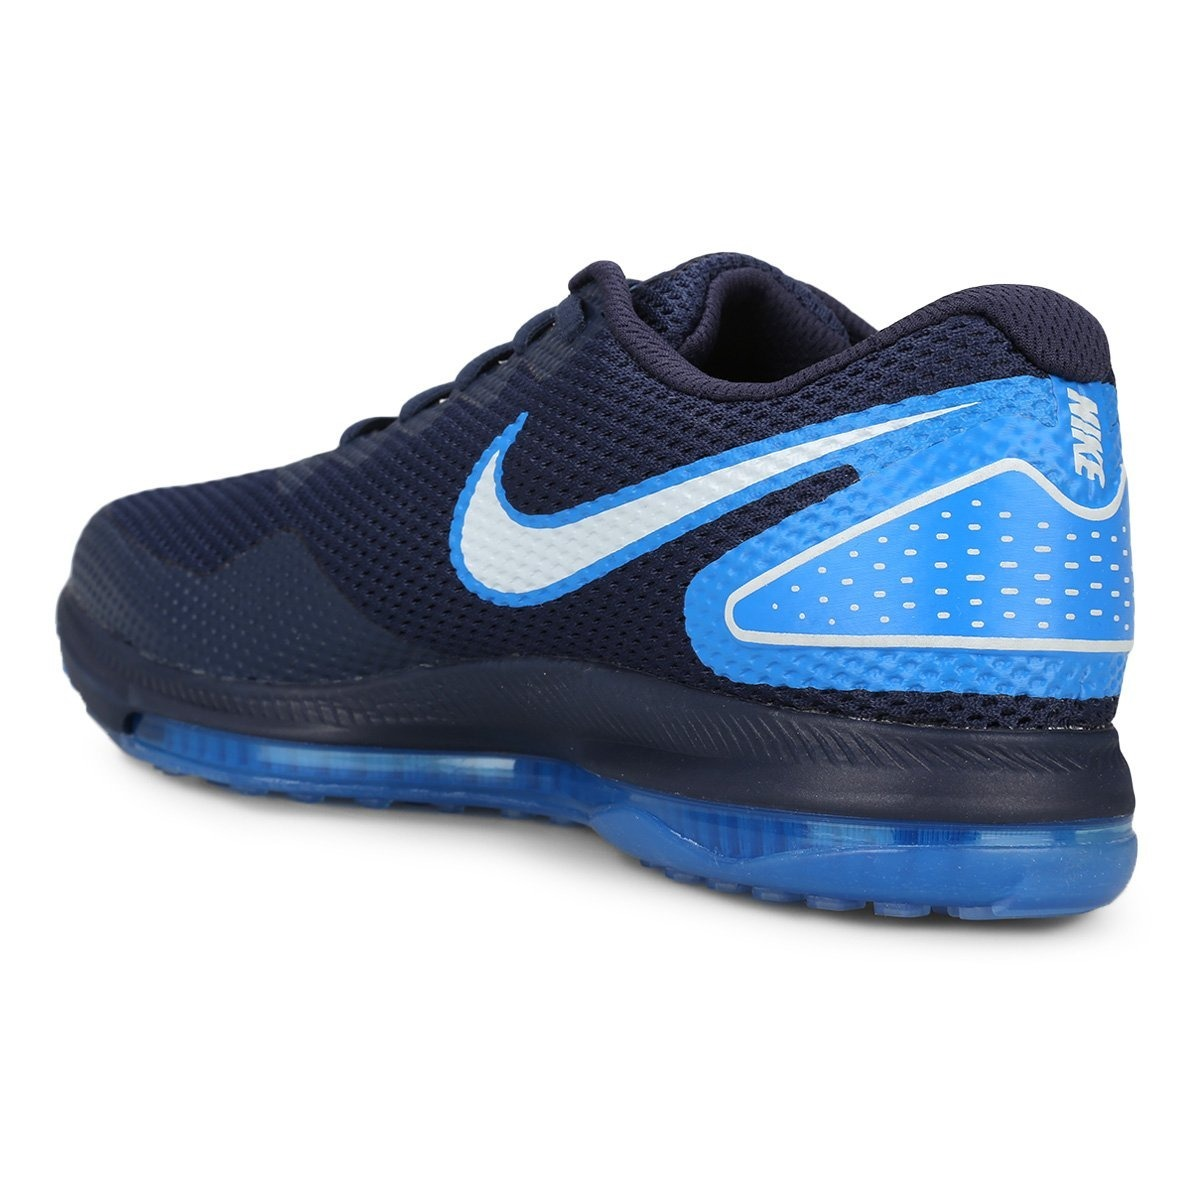 separation shoes 33ce7 4e6d9 zapatillas nike zoom all out low 2 - azul - preg descuento. Cargando zoom.